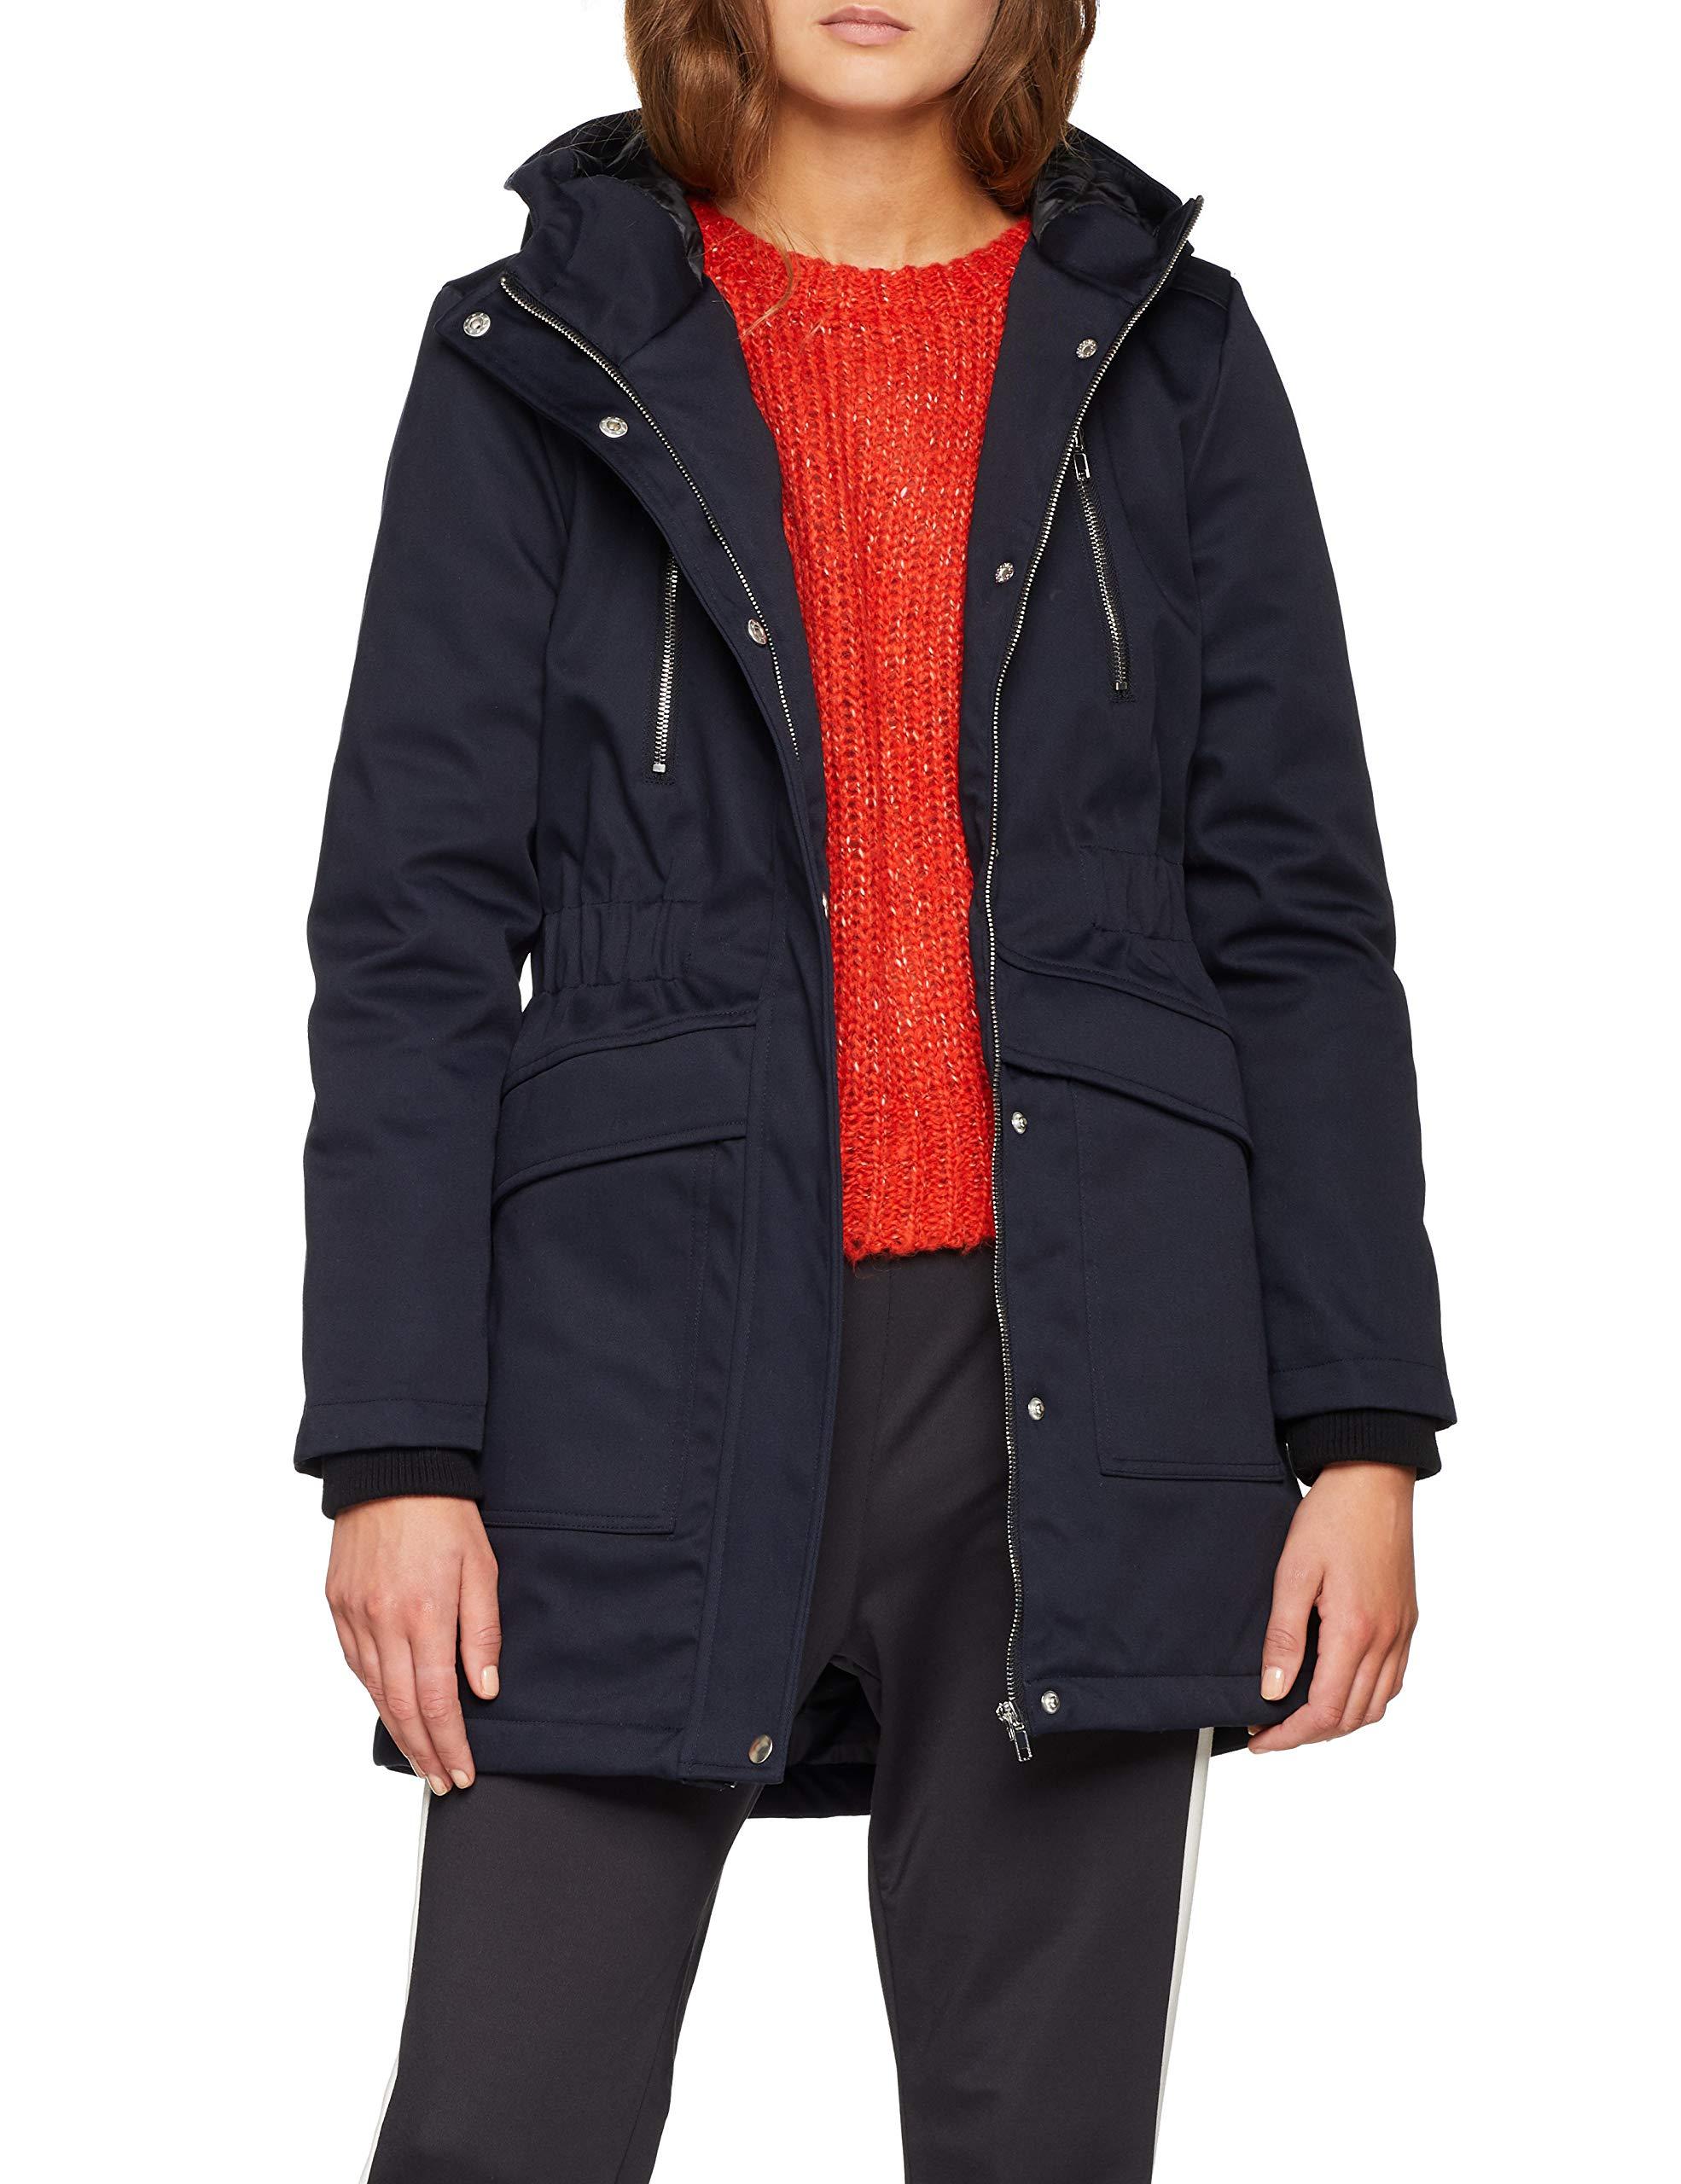 Coat Lenci Sparkz Femme ManteauBluenavy 78036 WD9b2IeEHY